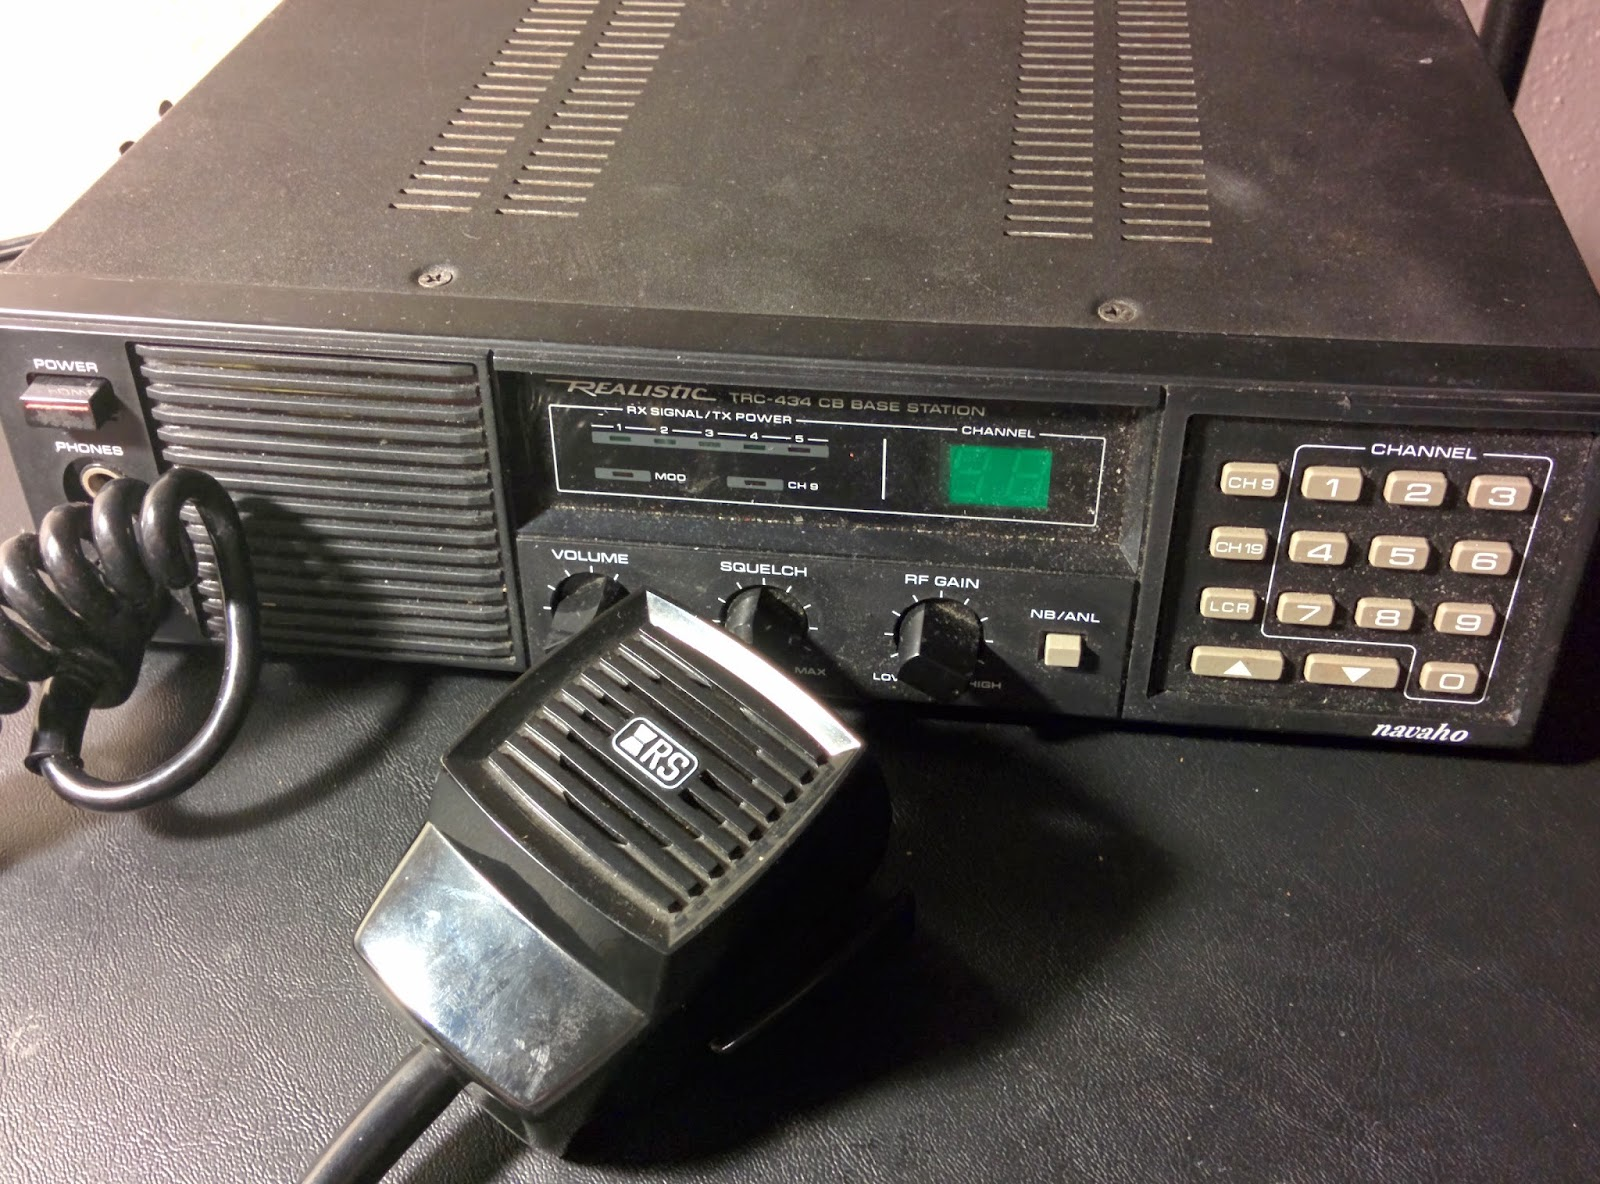 Retro Tech!: 1987: Realistic Navajo TRC-434 CB Radio Base